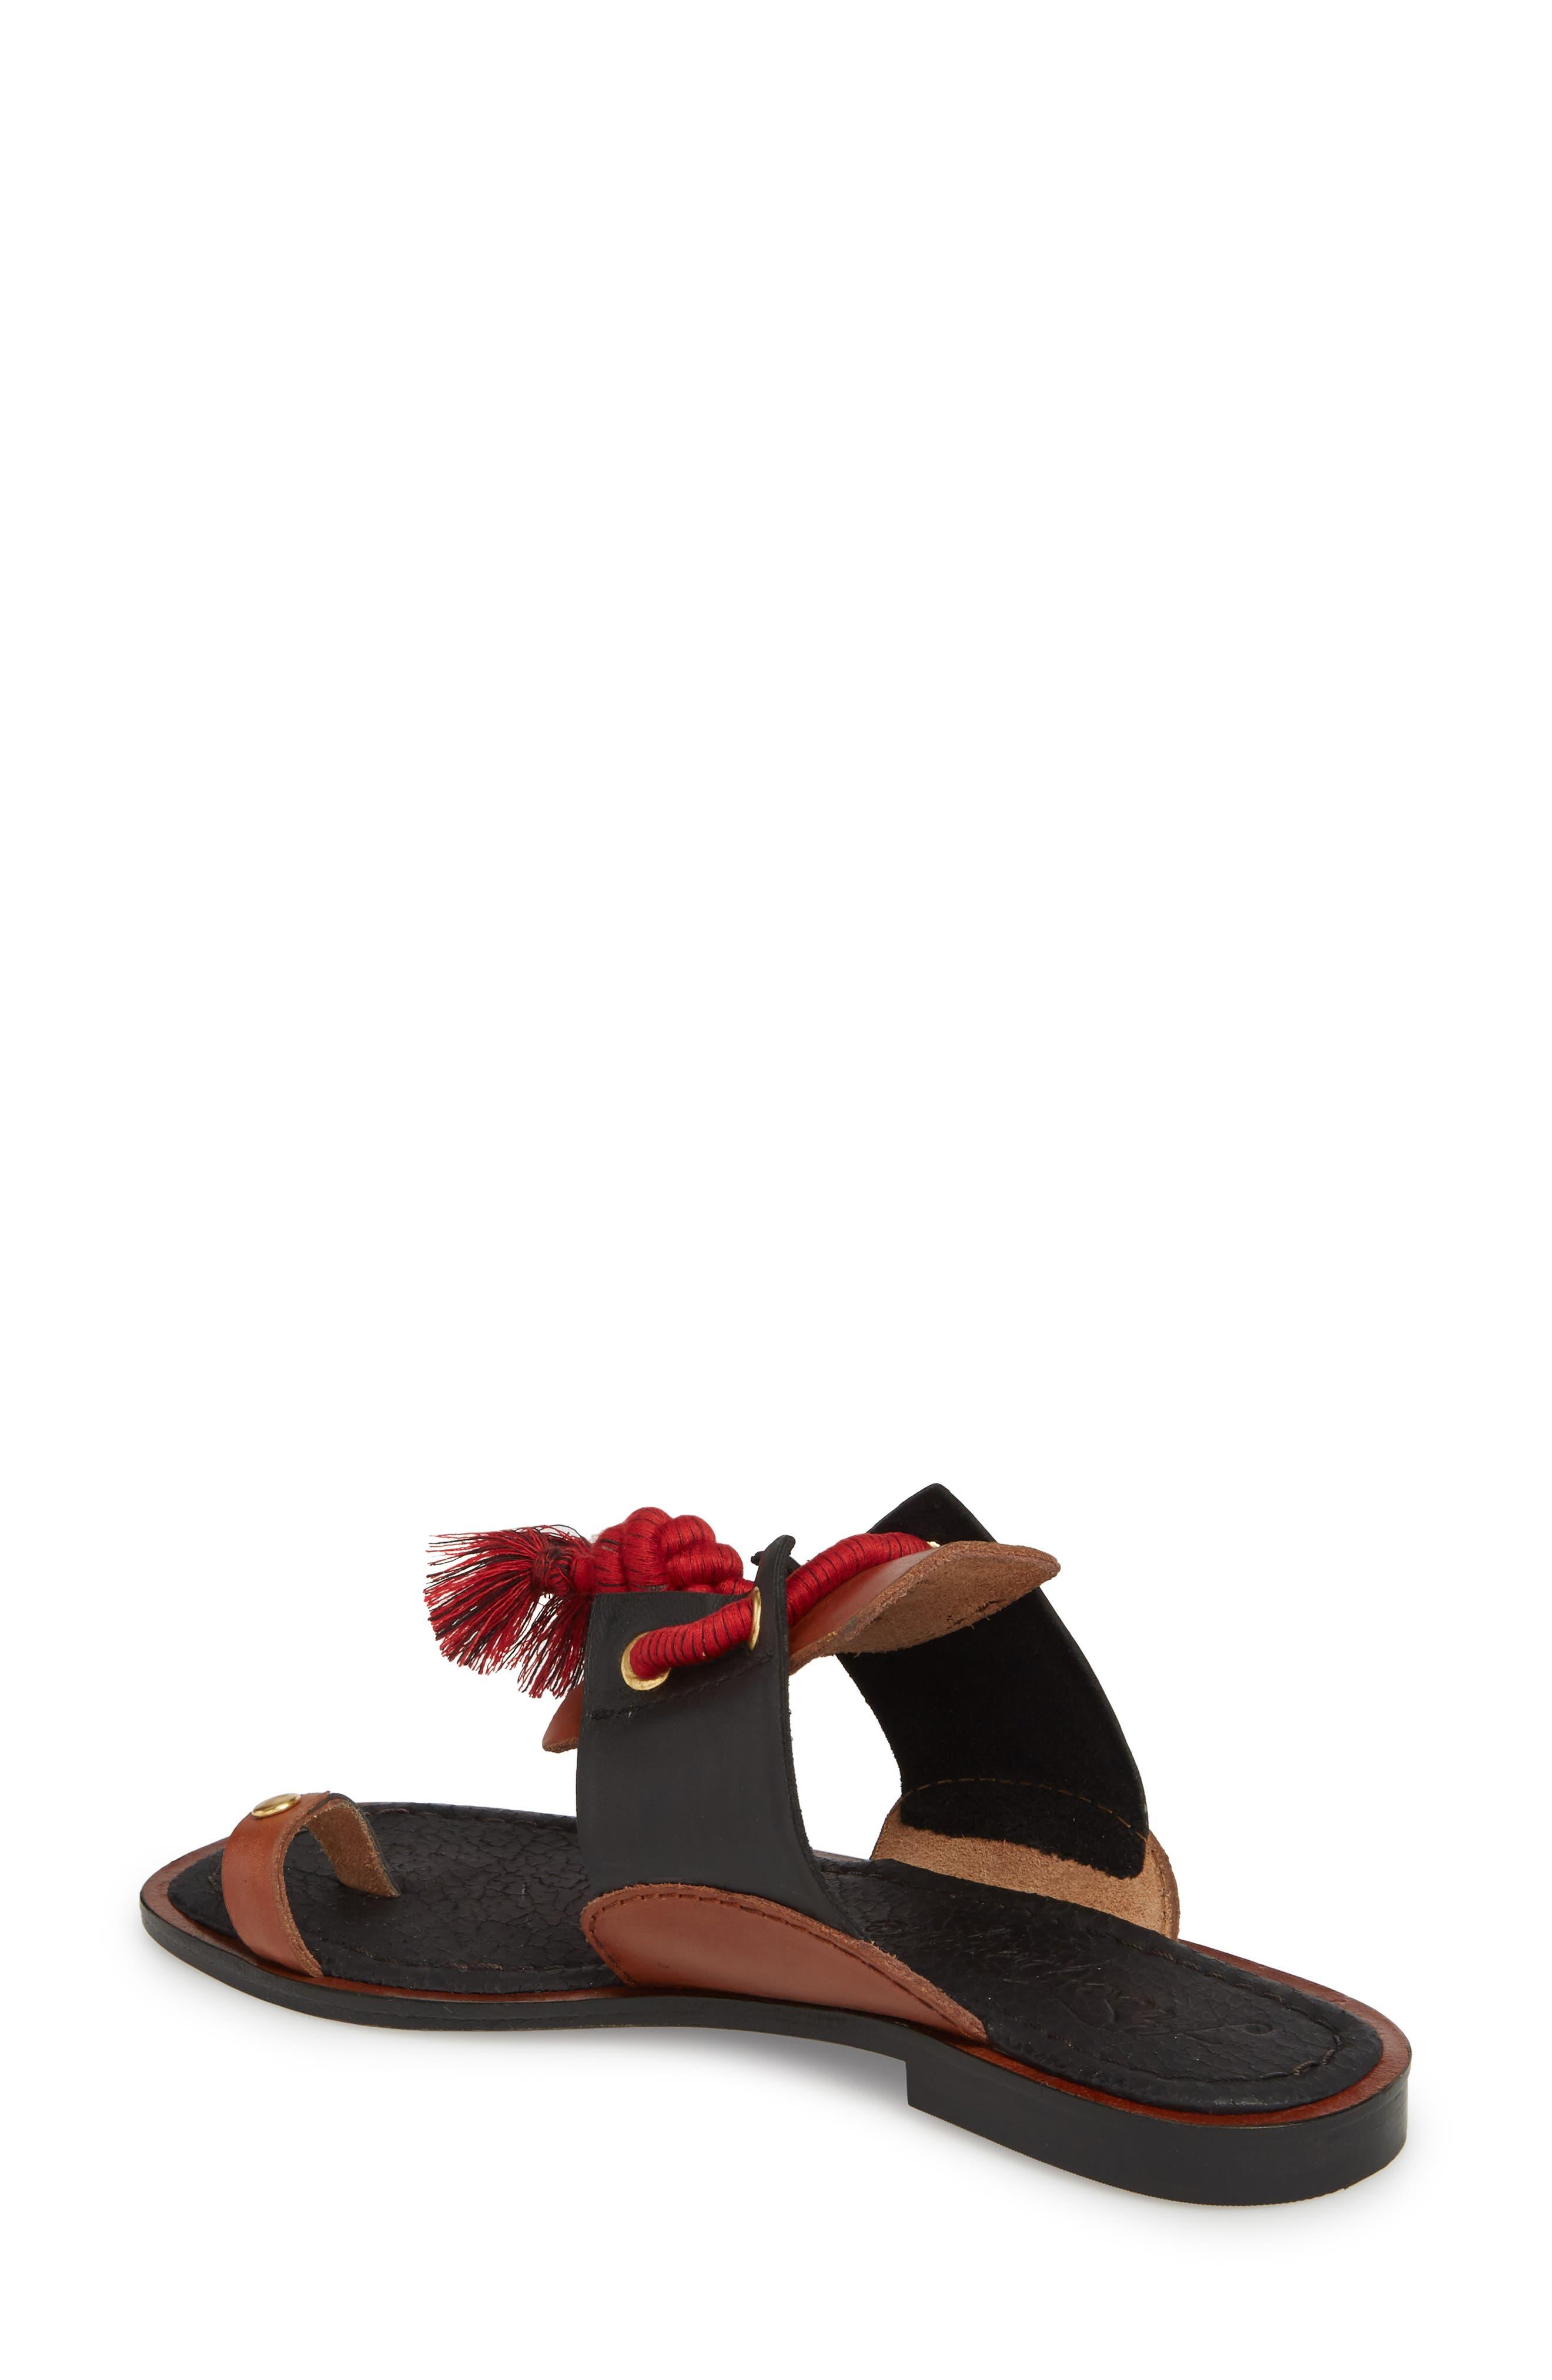 Maui Tasseled Slide Sandal,                             Alternate thumbnail 2, color,                             001